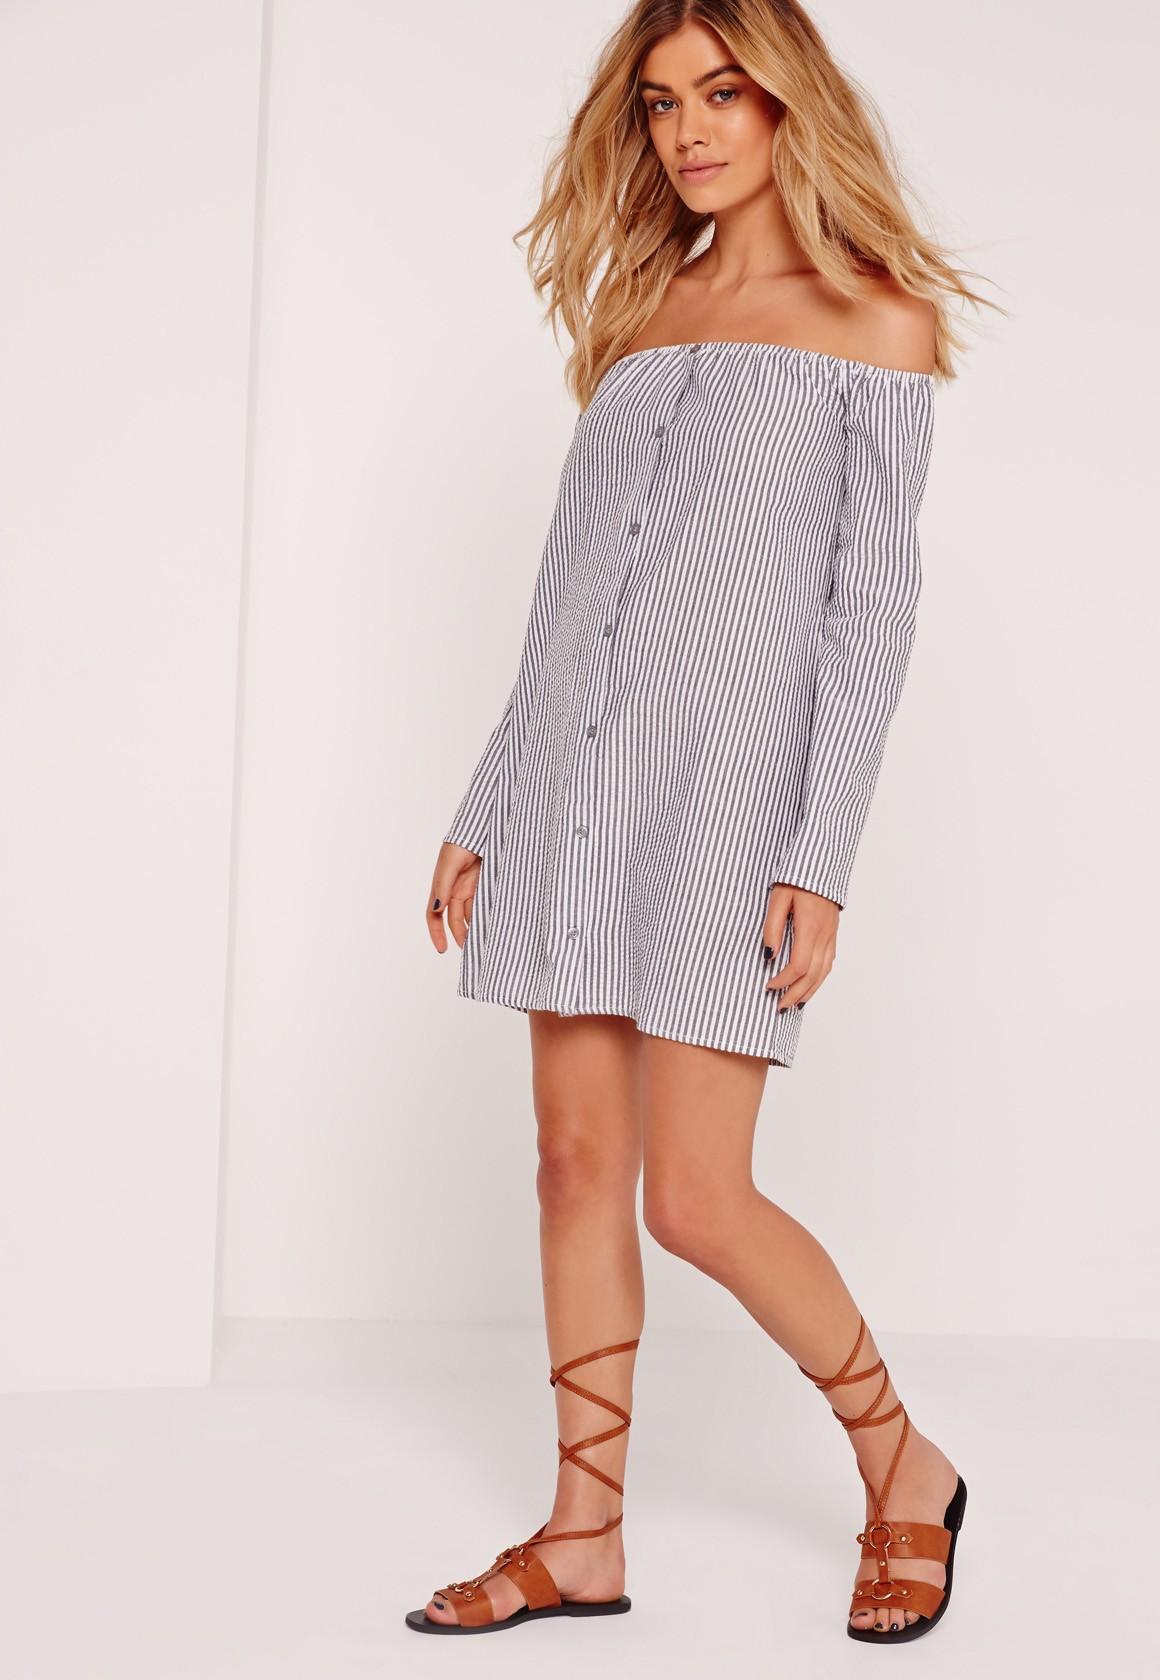 Miss Guided Bardot Dress